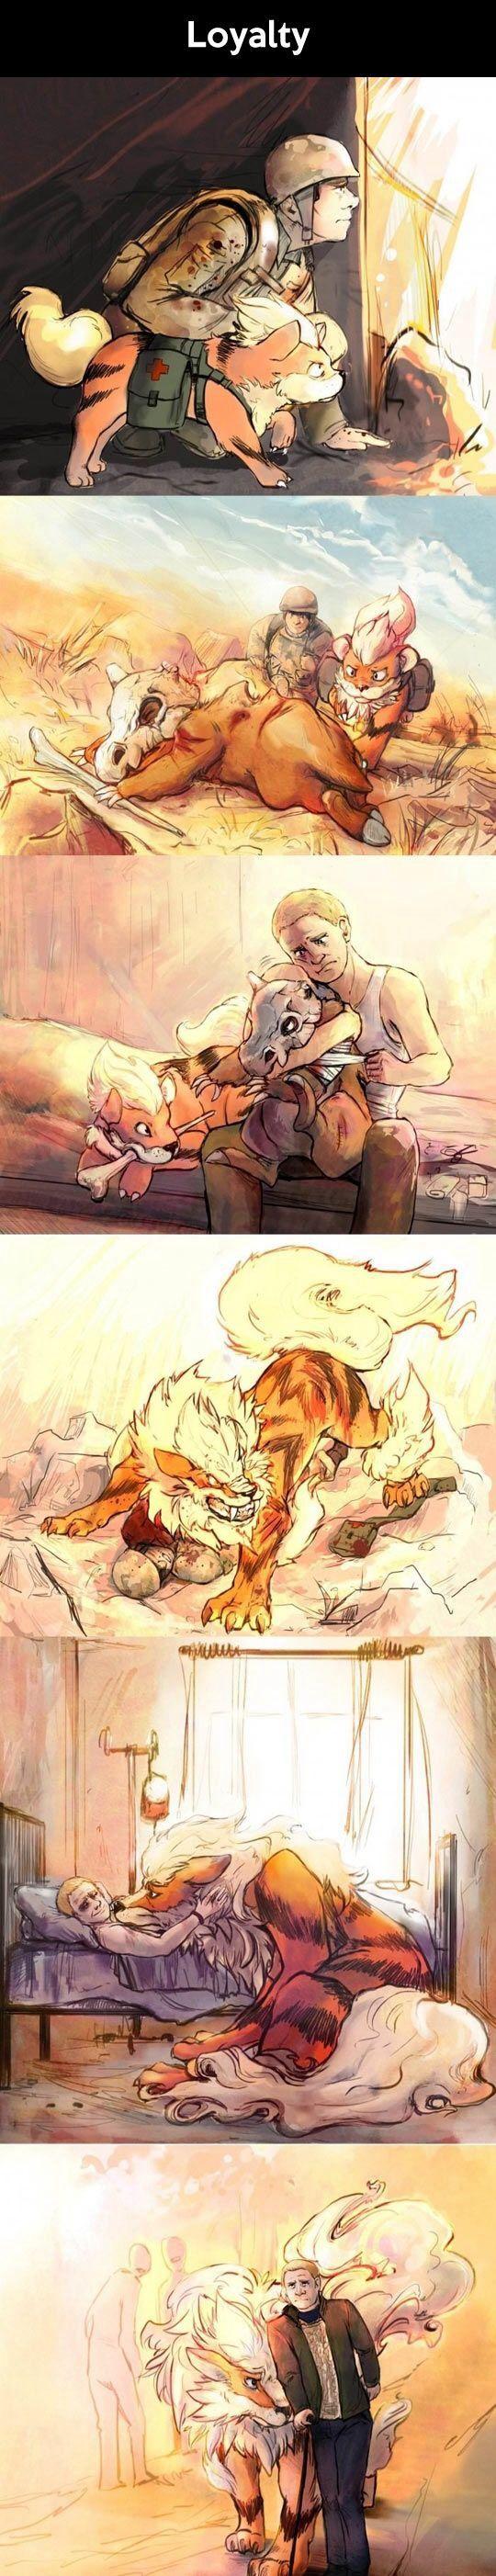 Pokemon and Sherlock crossover! So great!